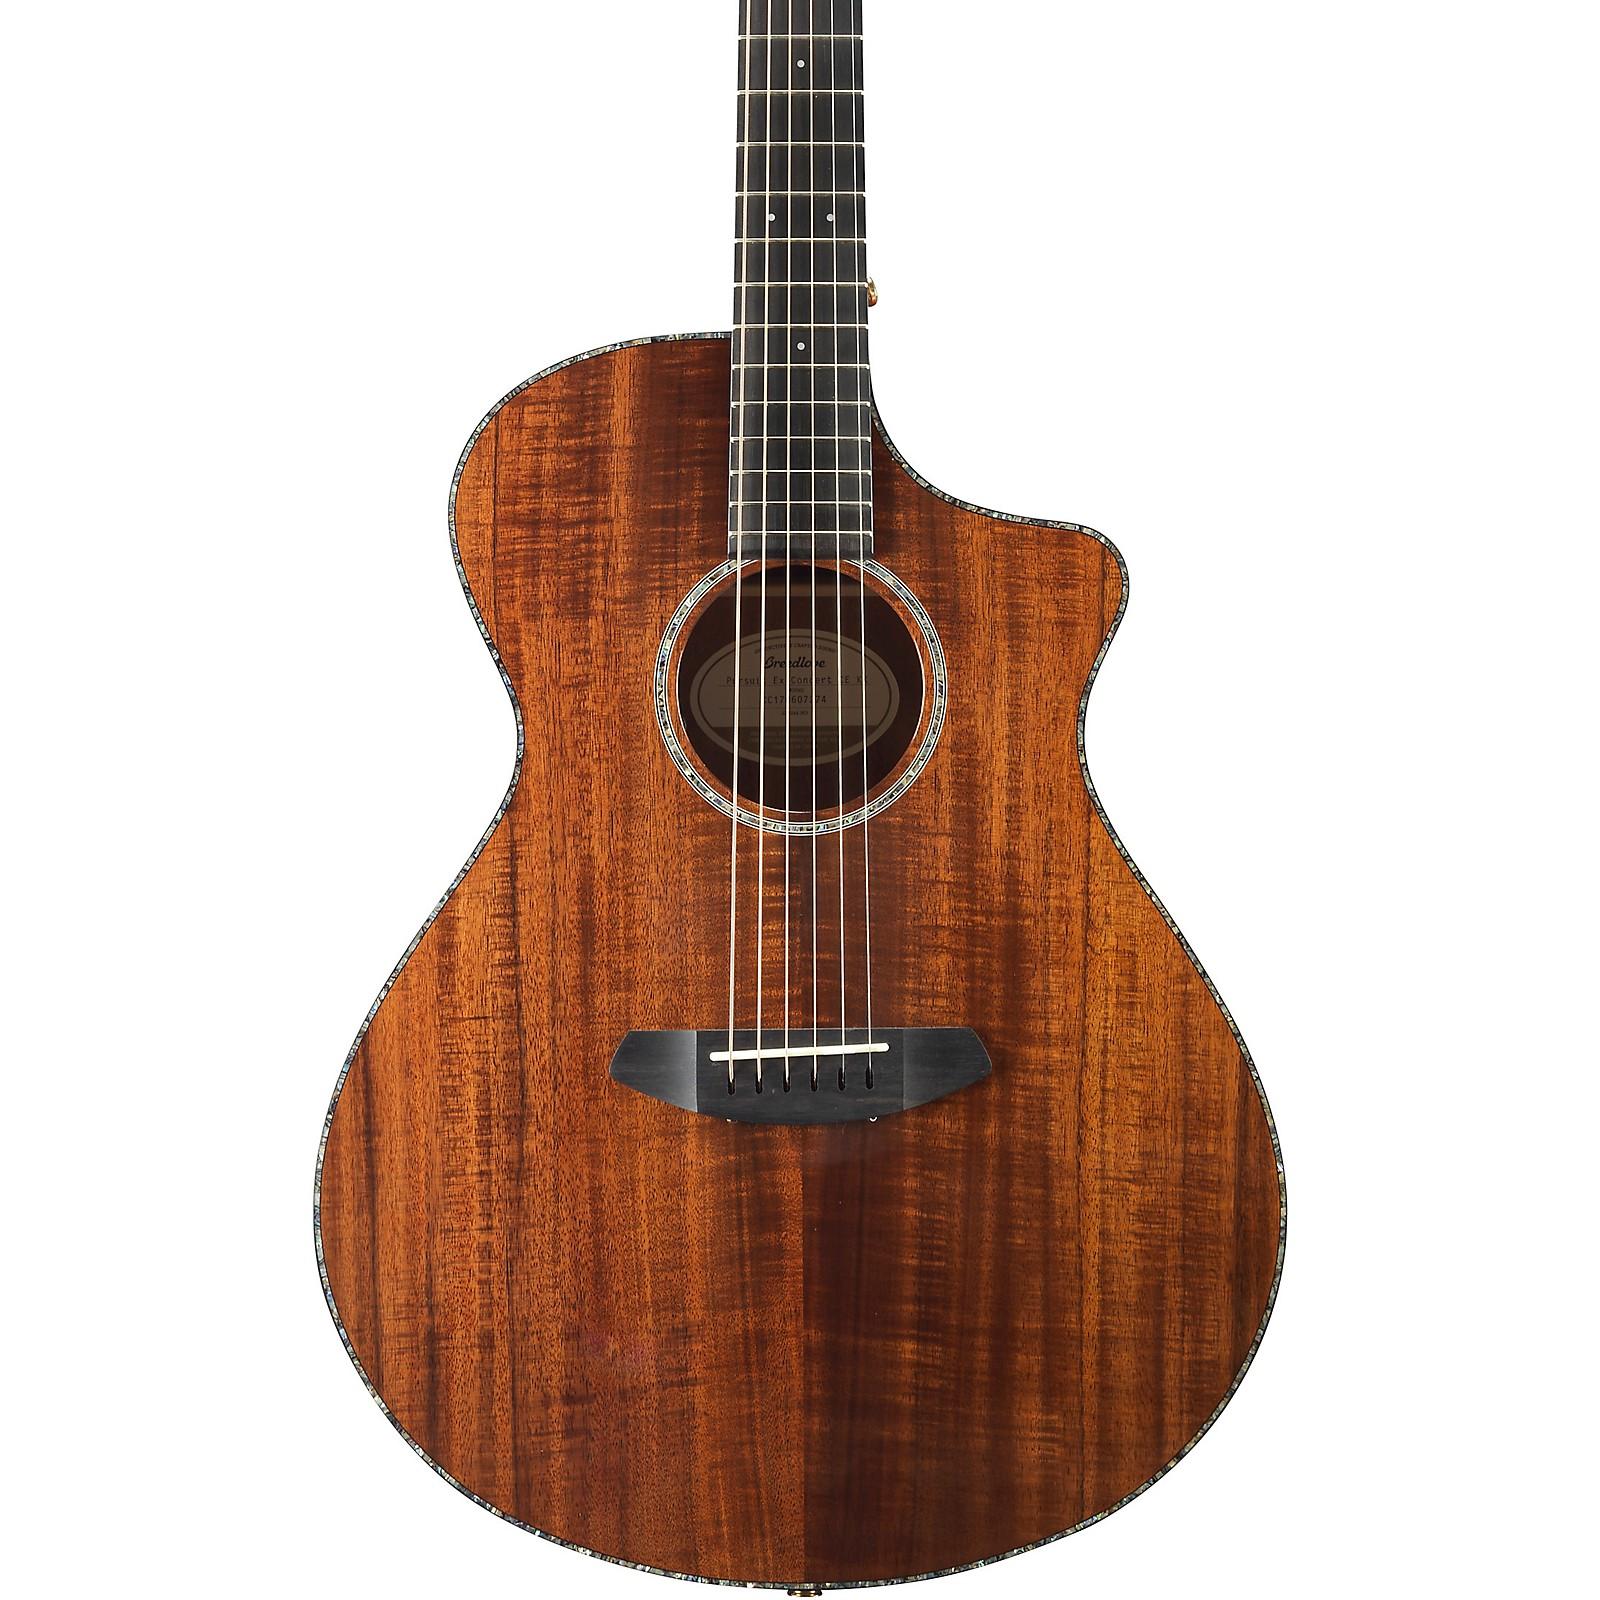 Breedlove Pursuit Exotic Concert with Koa Top Acoustic-Electric Guitar